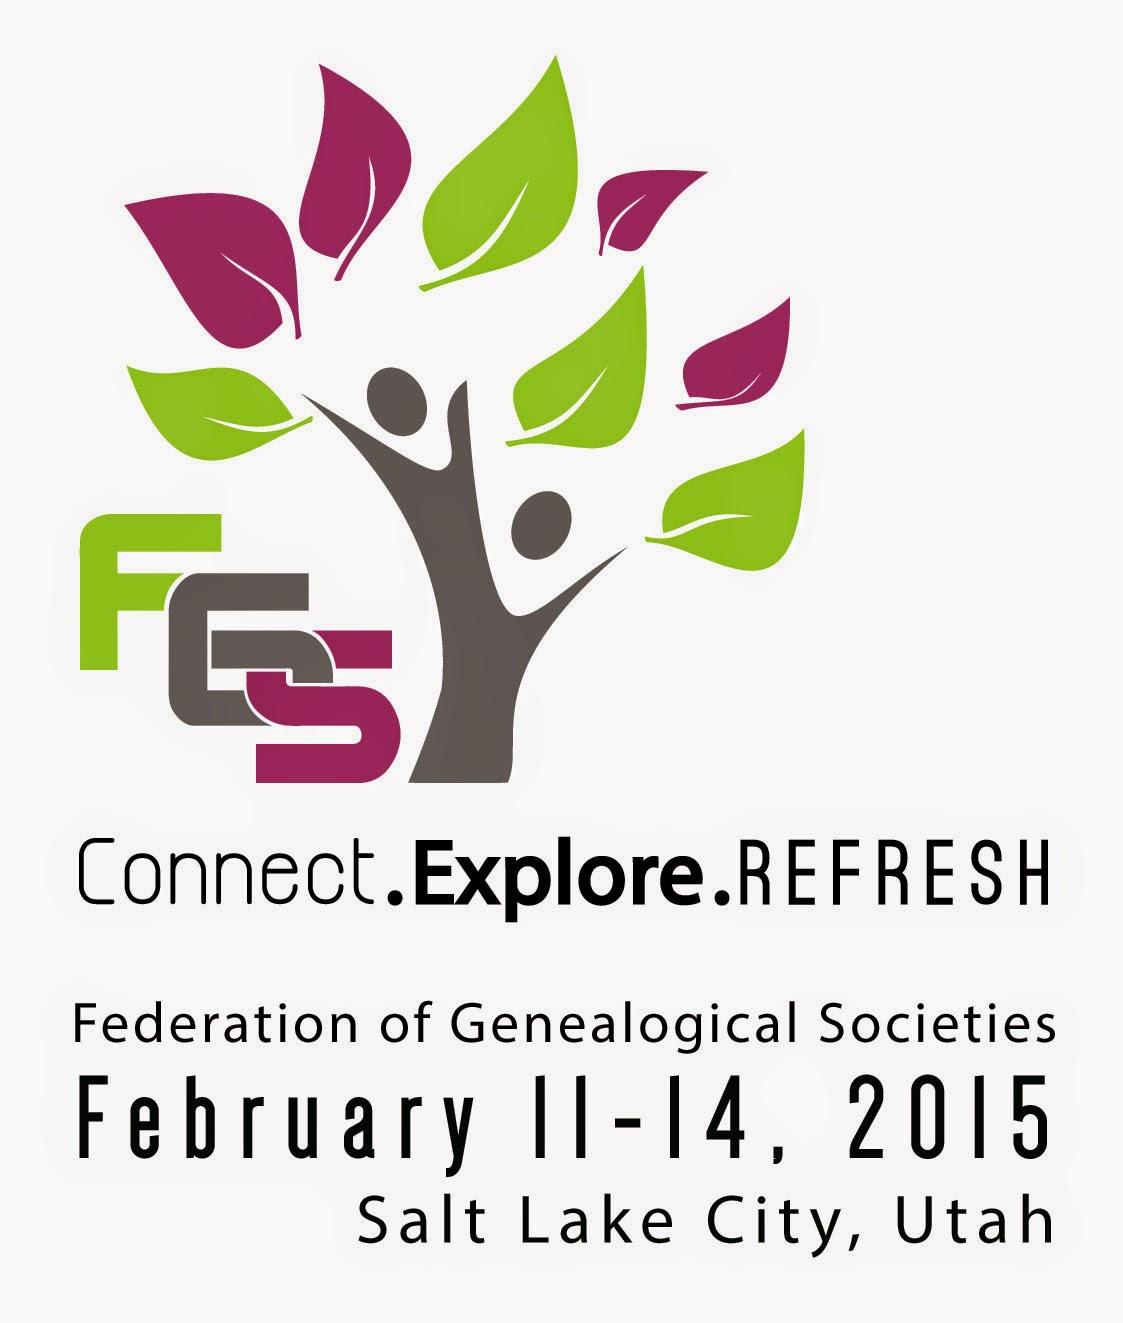 FGS Conference 2015